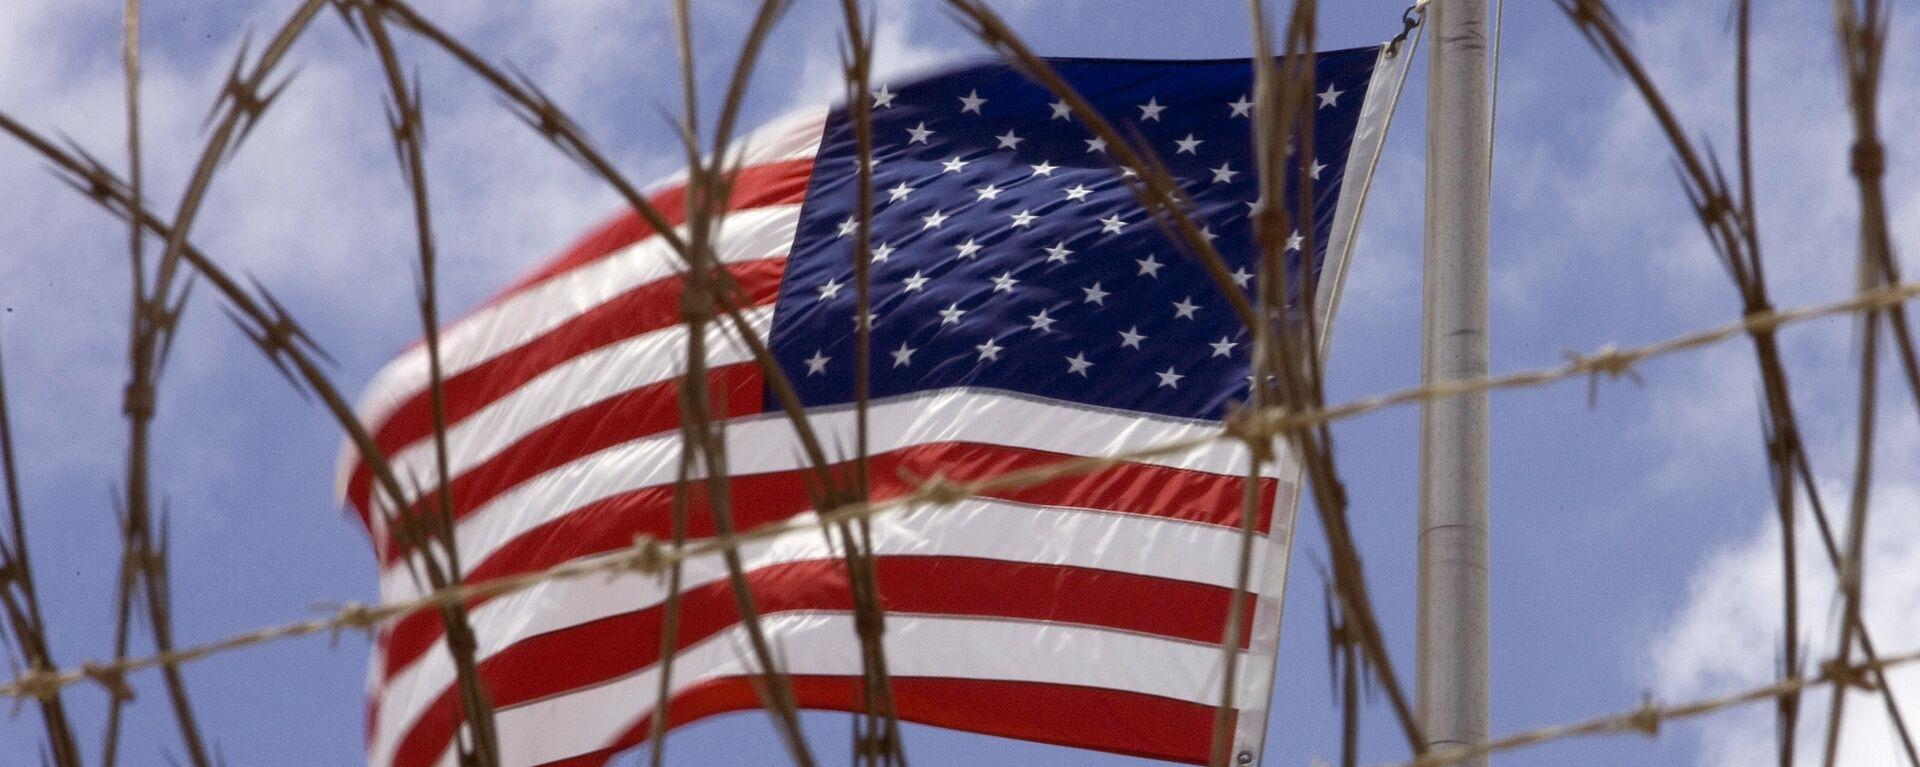 La bandera de EEUU en Guantánamo, Cuba - Sputnik Mundo, 1920, 26.04.2021